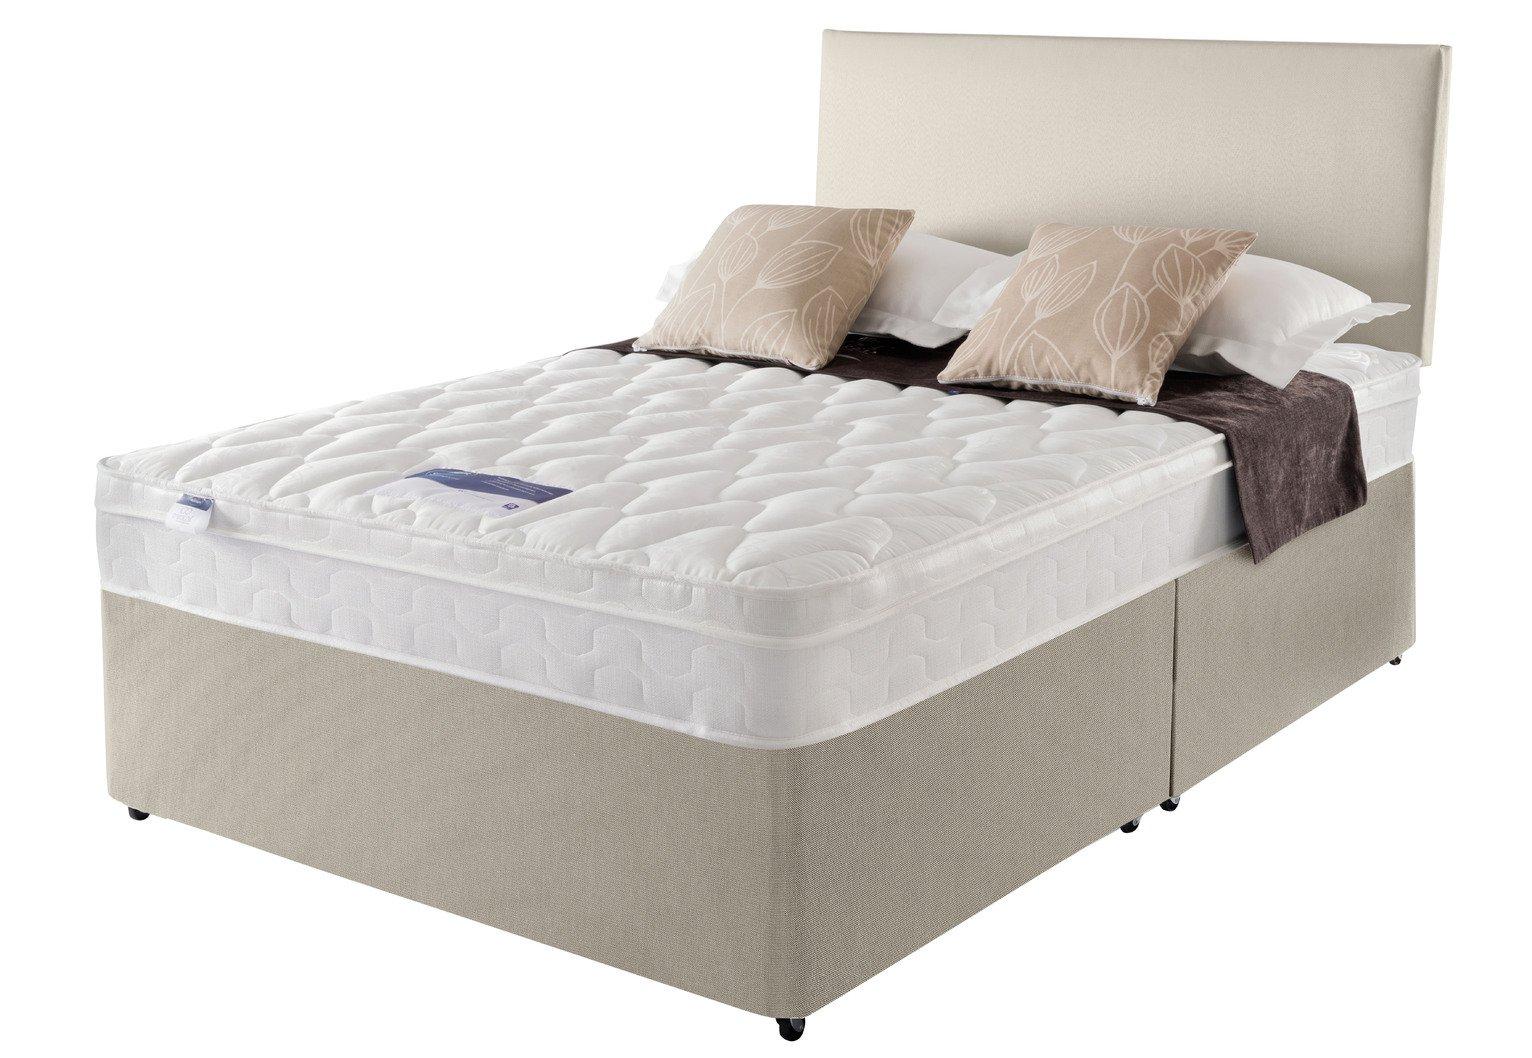 Silentnight Auckland Natural Divan Bed - Kingsize